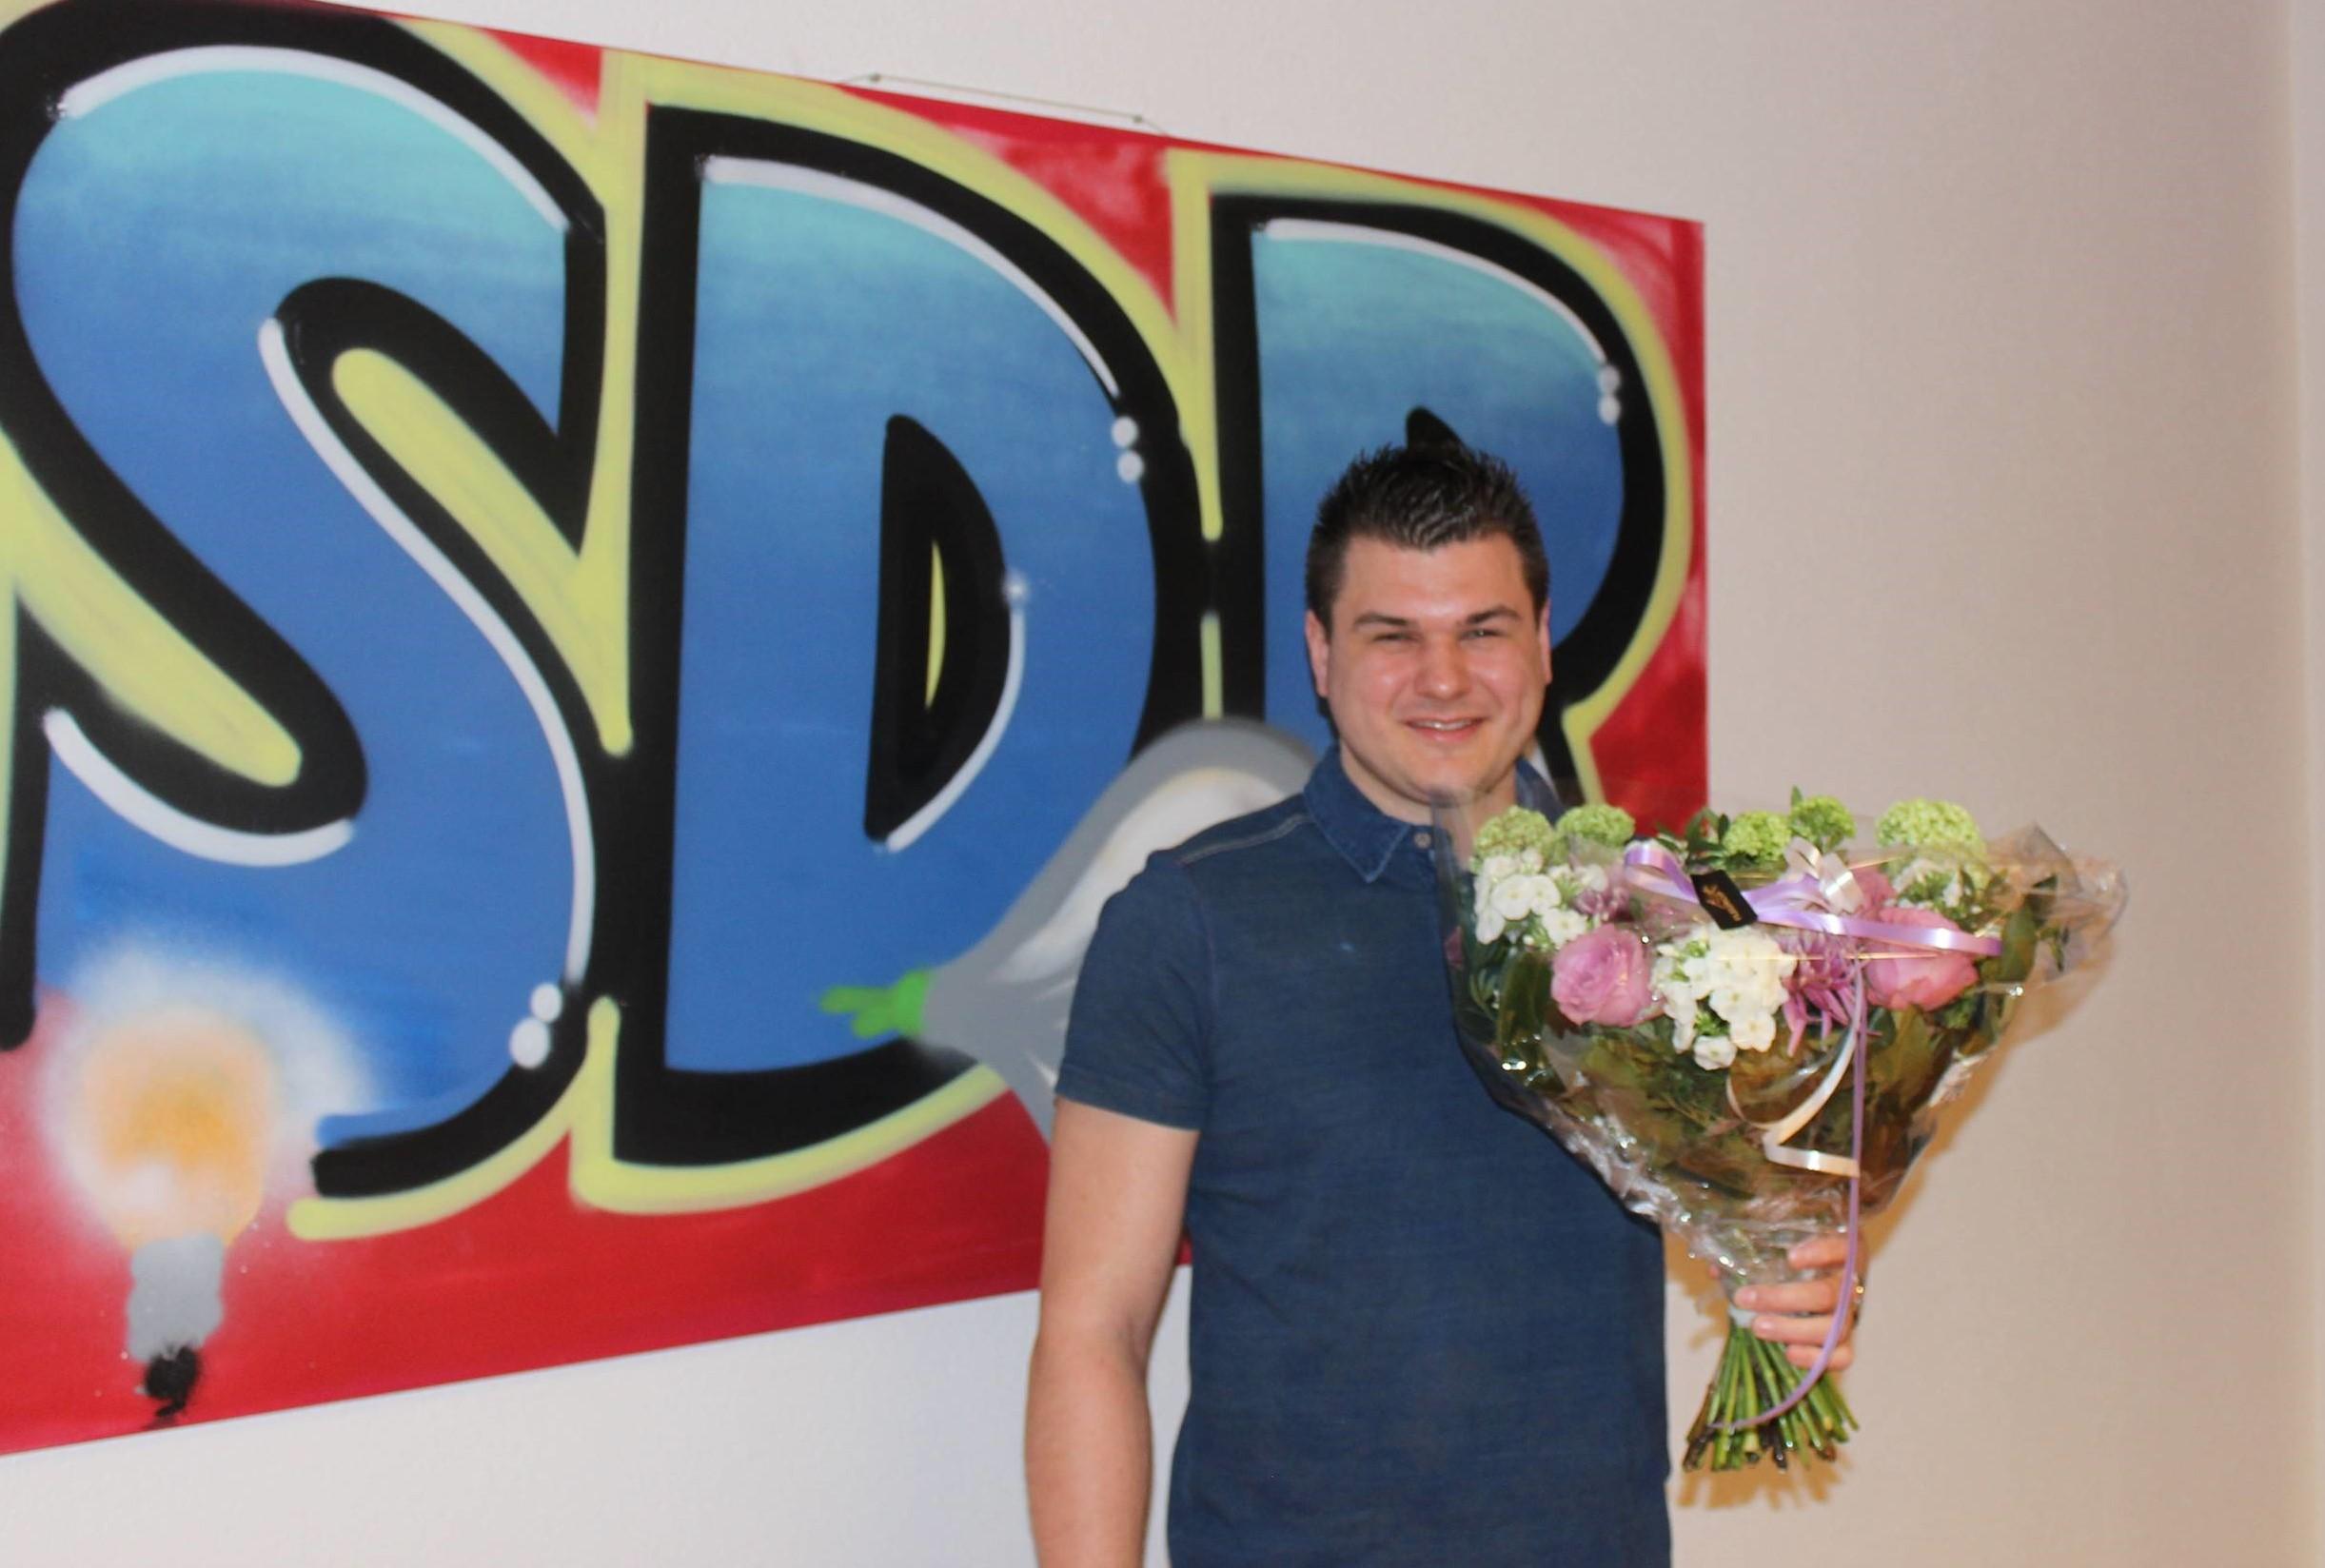 Maurice Ales 12,5 jaar in dienst bij SDR!